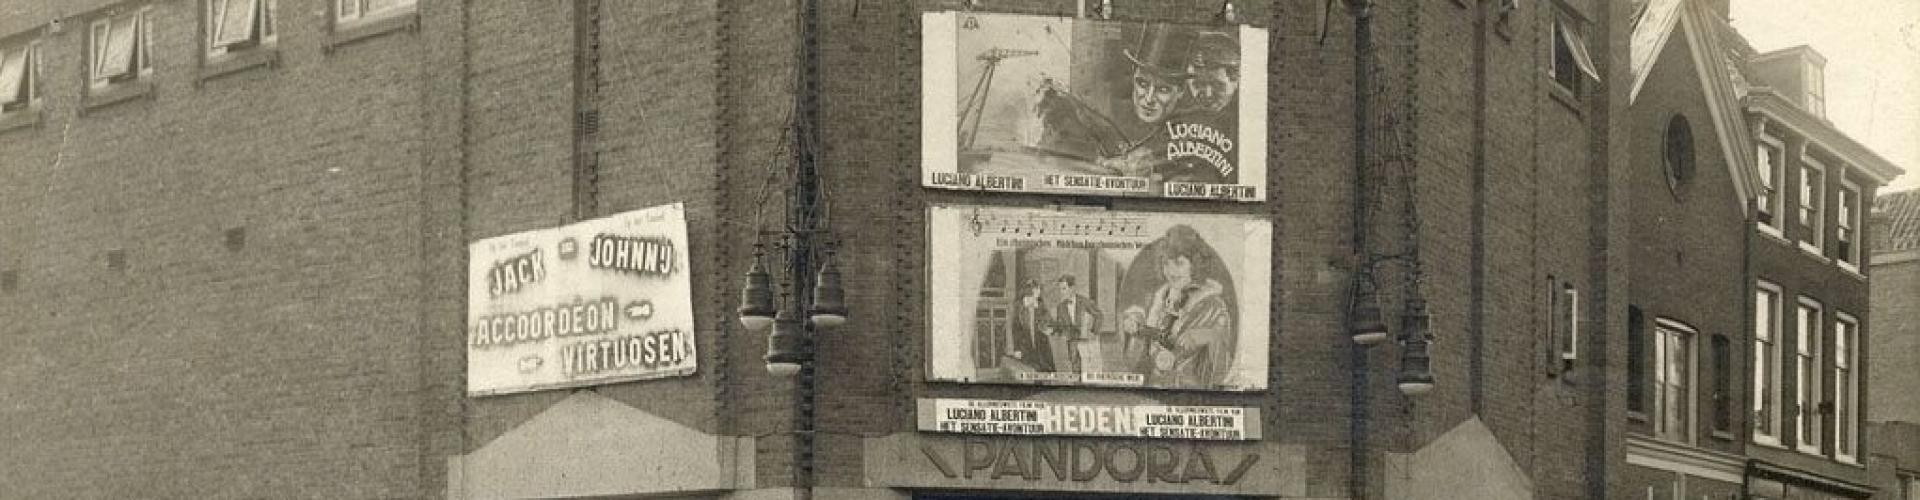 Pandora - Monopole bioscoop Schiedam